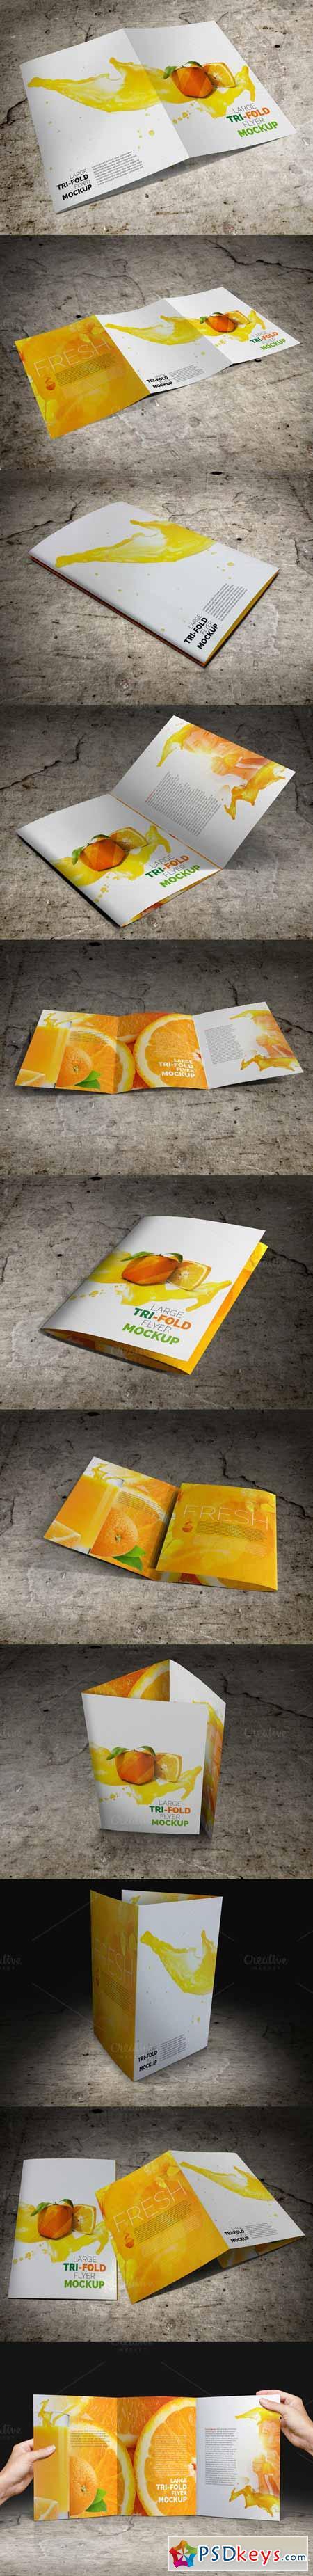 Large Trifold Brochure Mockup 388213